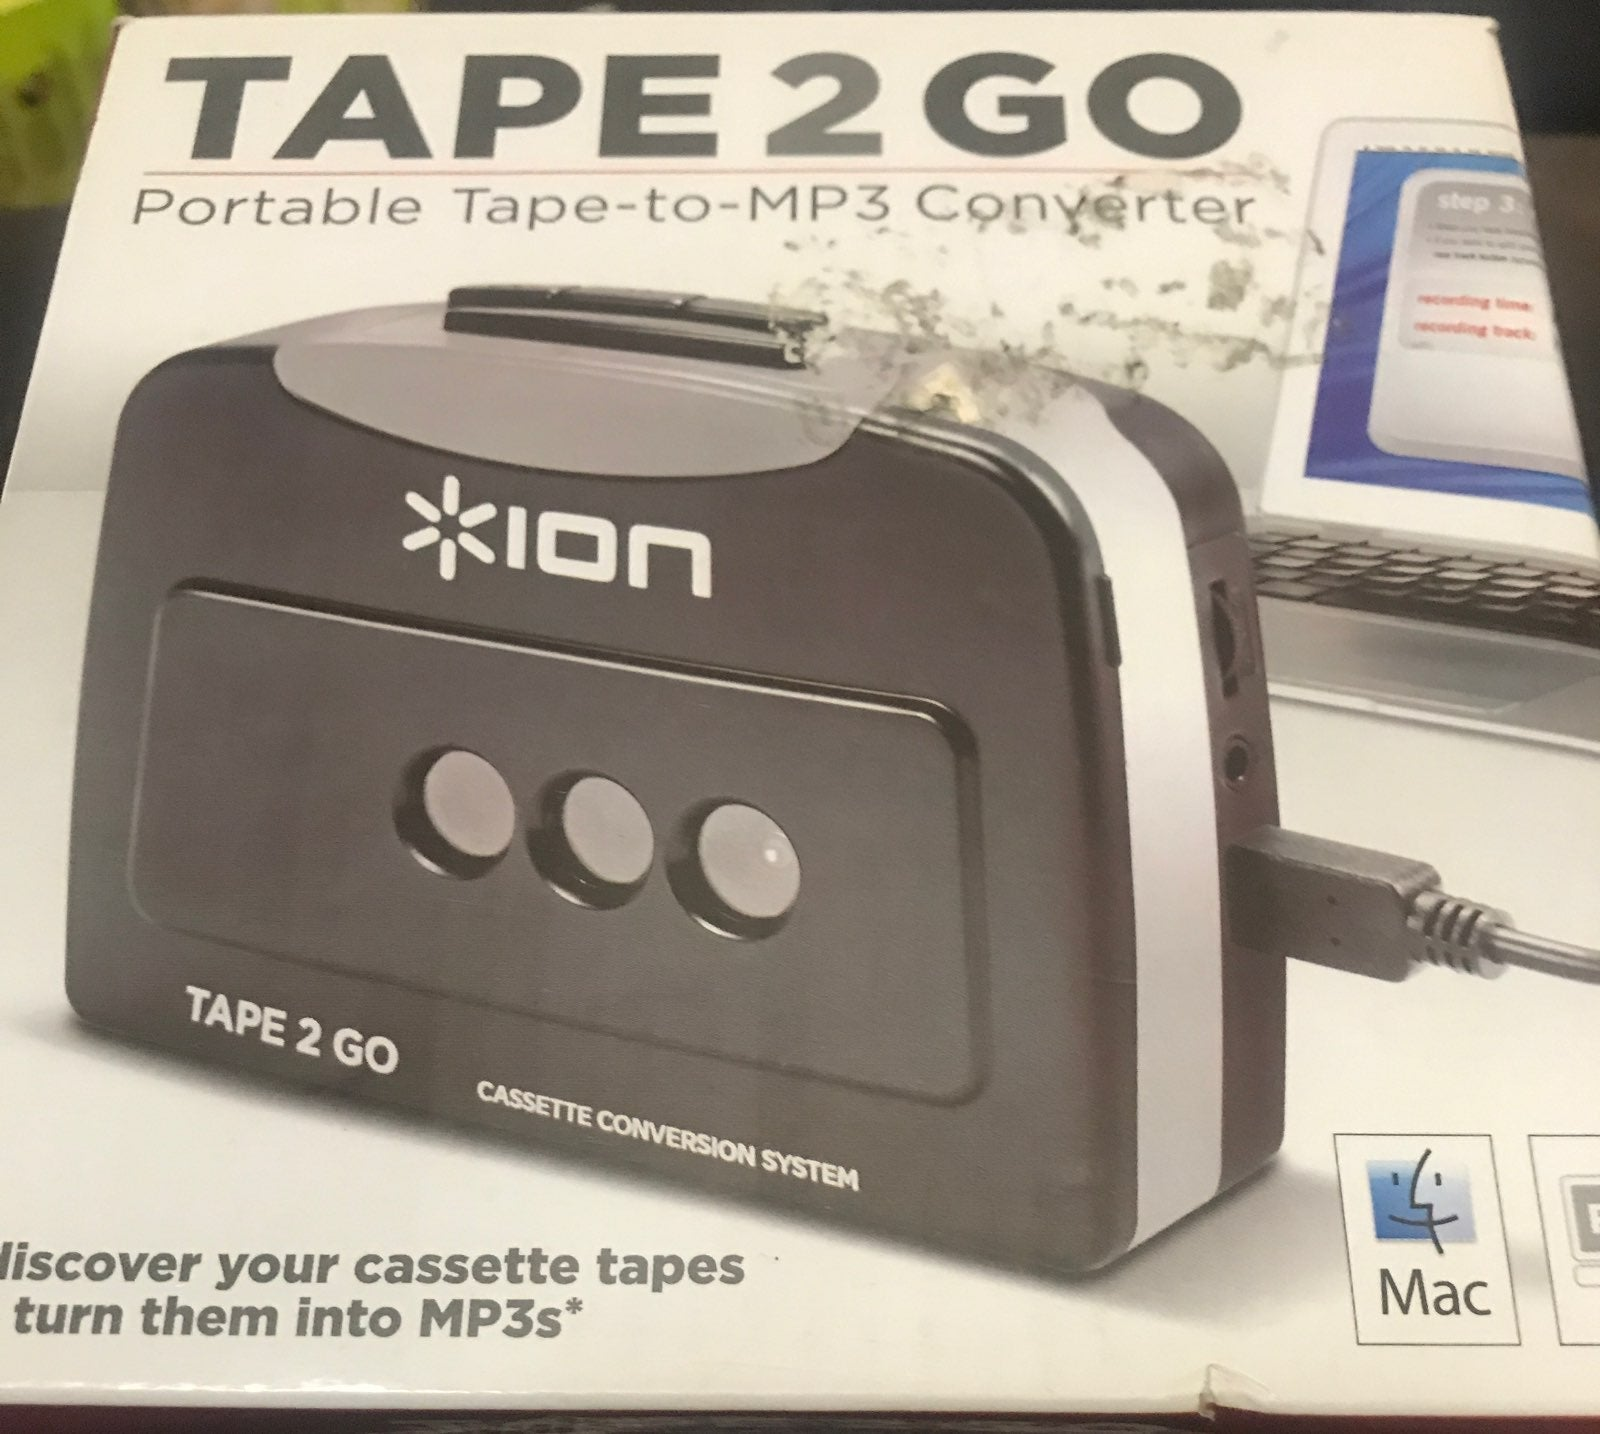 Tape 2 GO Portable-to.-MP3 Converter